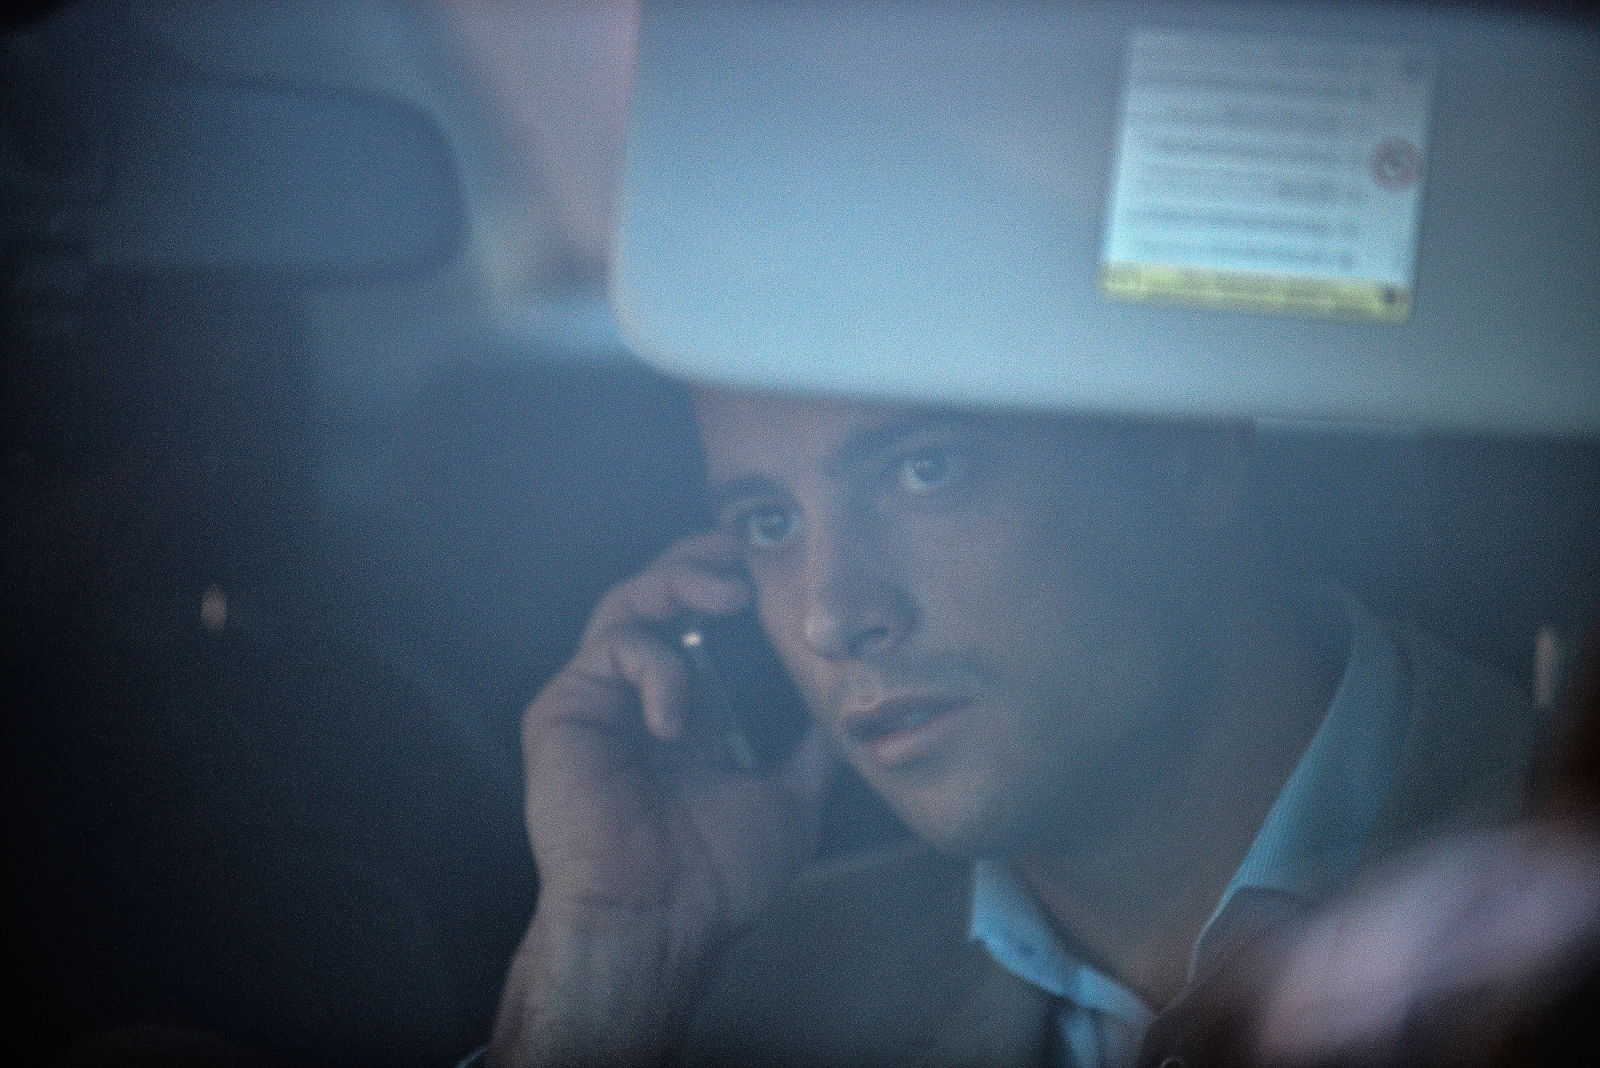 Oscar Pistorius made a secret phone call to ex-girlfriend Jenna Edkins shortly before he killed Reeva Steenkamp